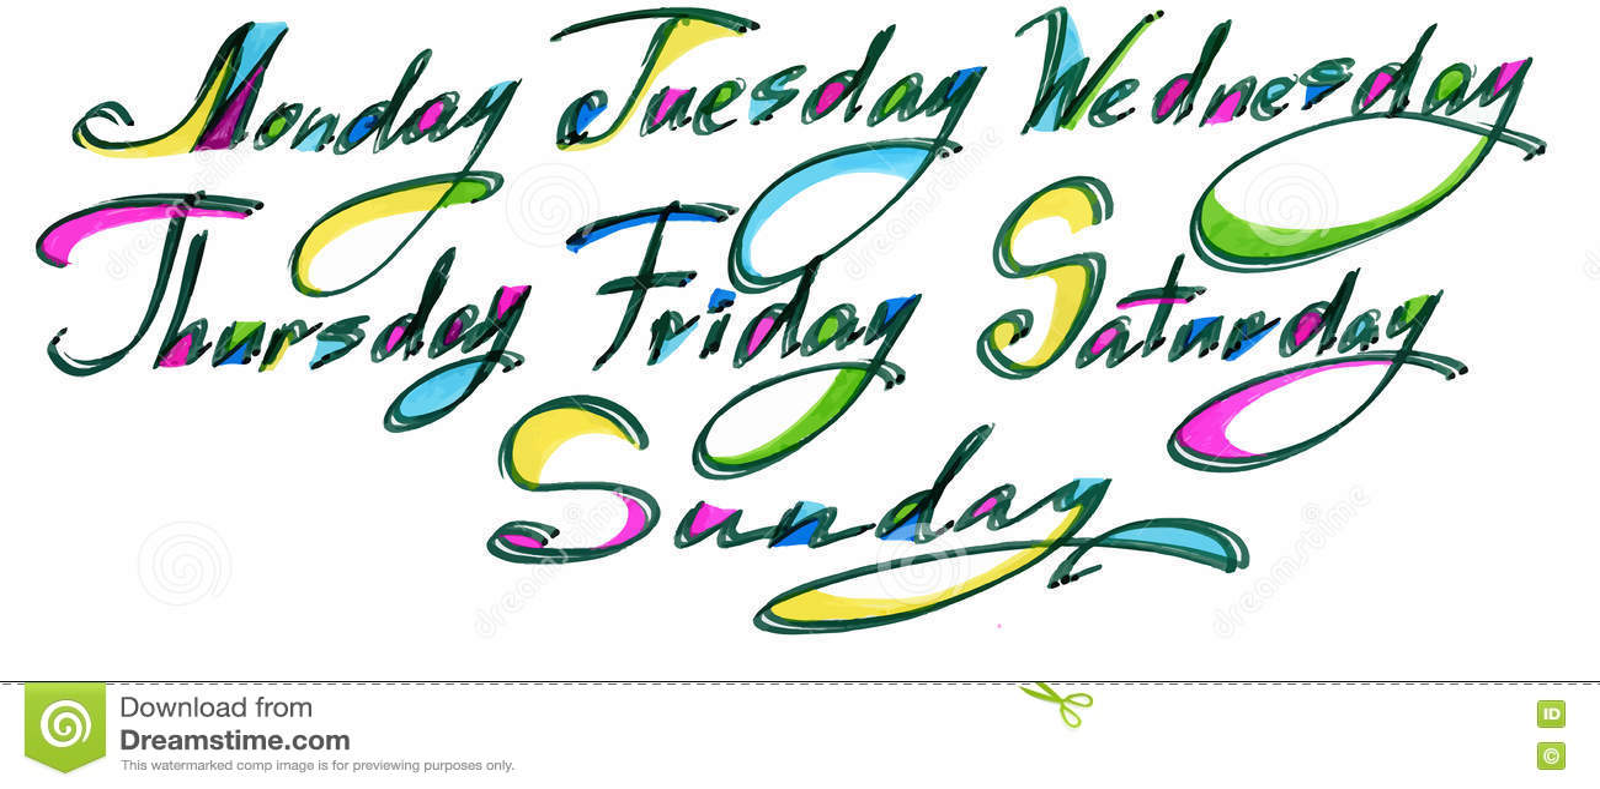 handwritten days of the week monday tuesday wednesday thursday